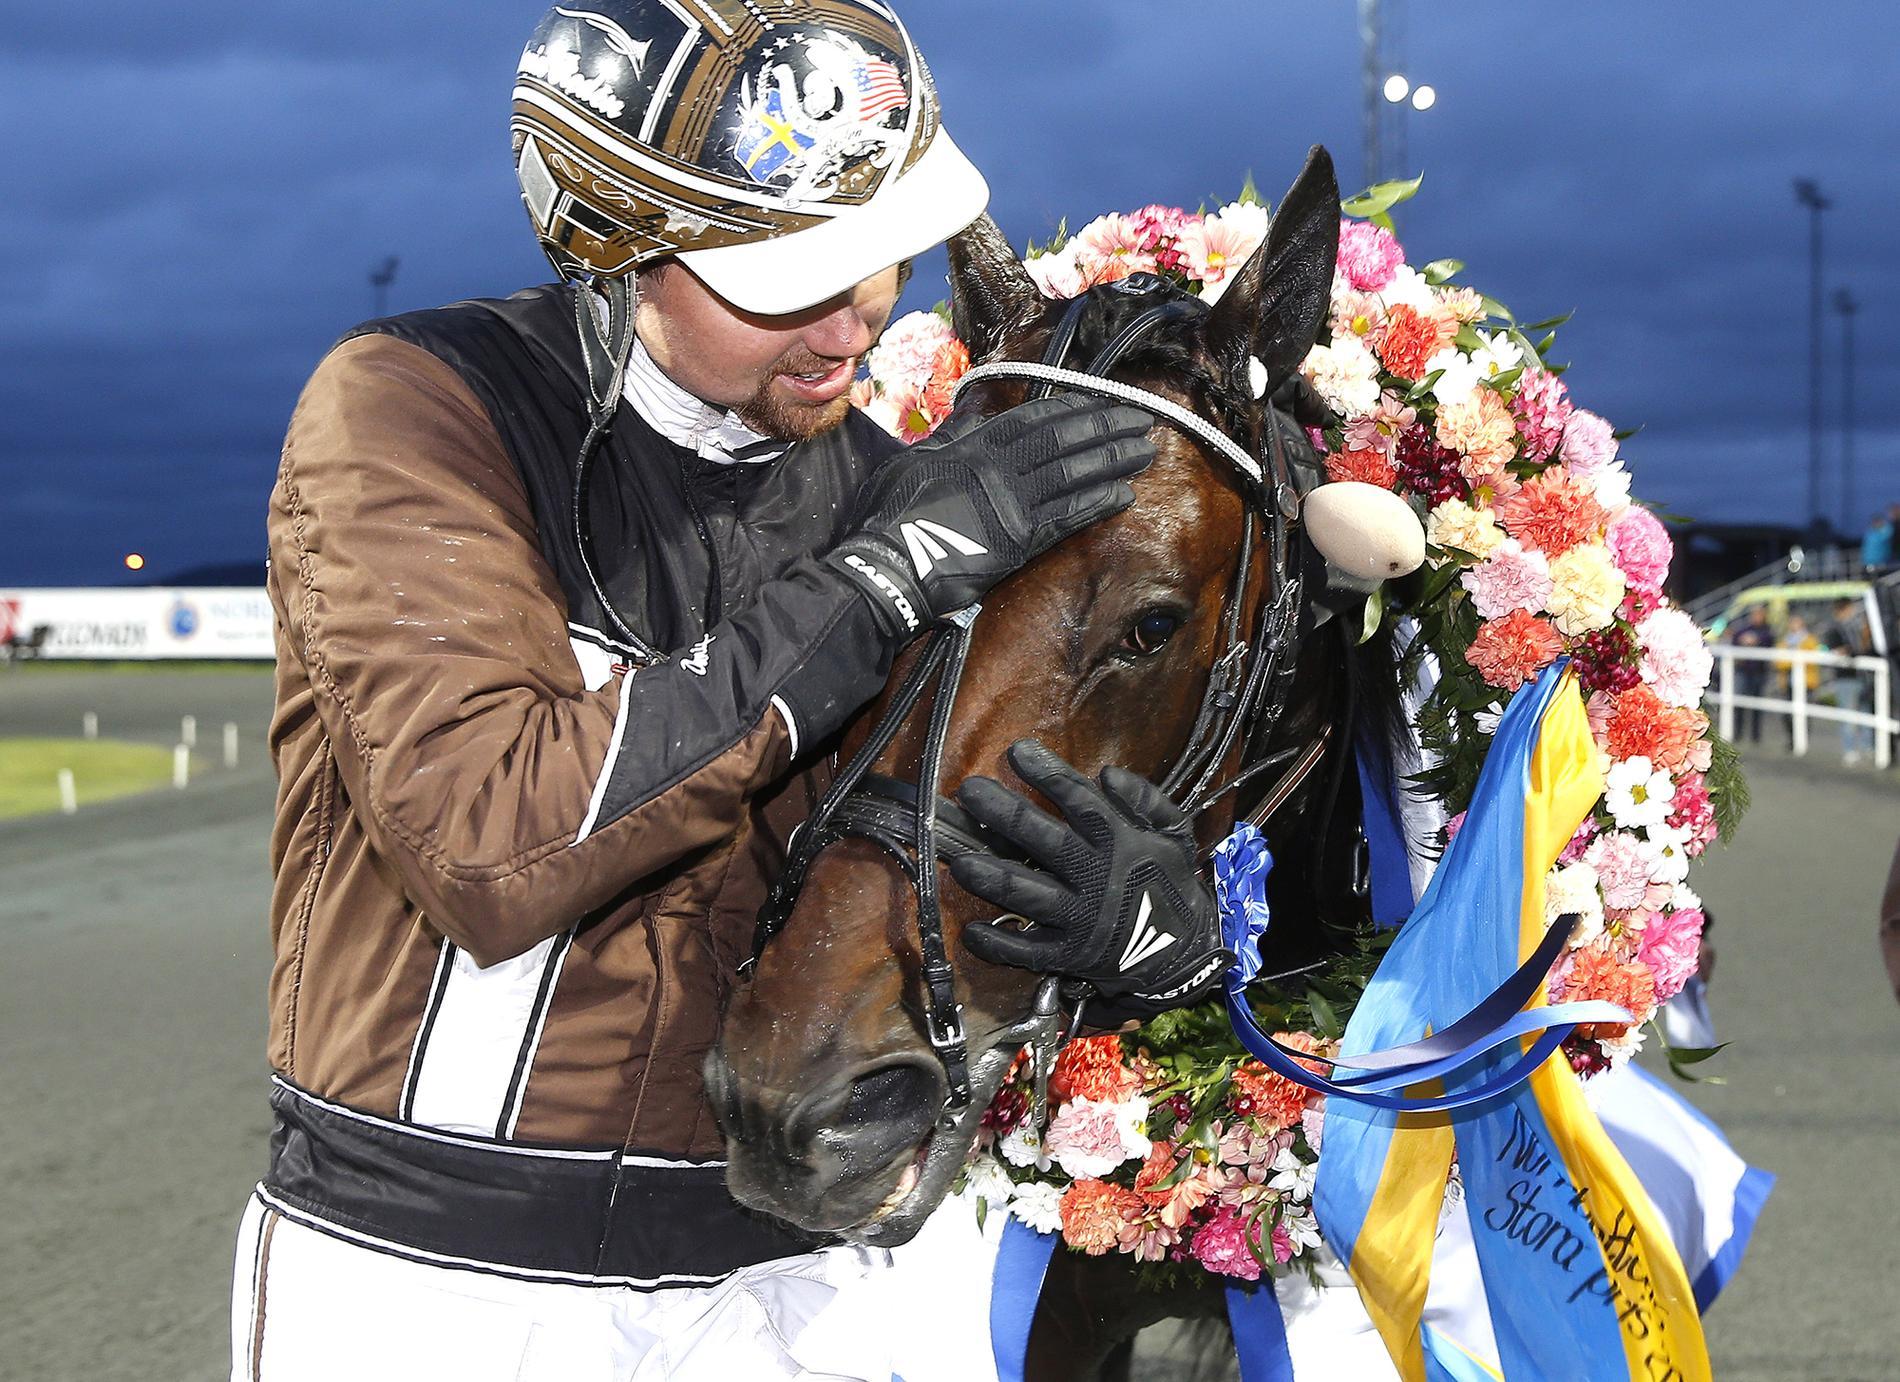 Propulsion vinner Prix de France, enligt Sportbladets krönikör Mattias Karlsson.